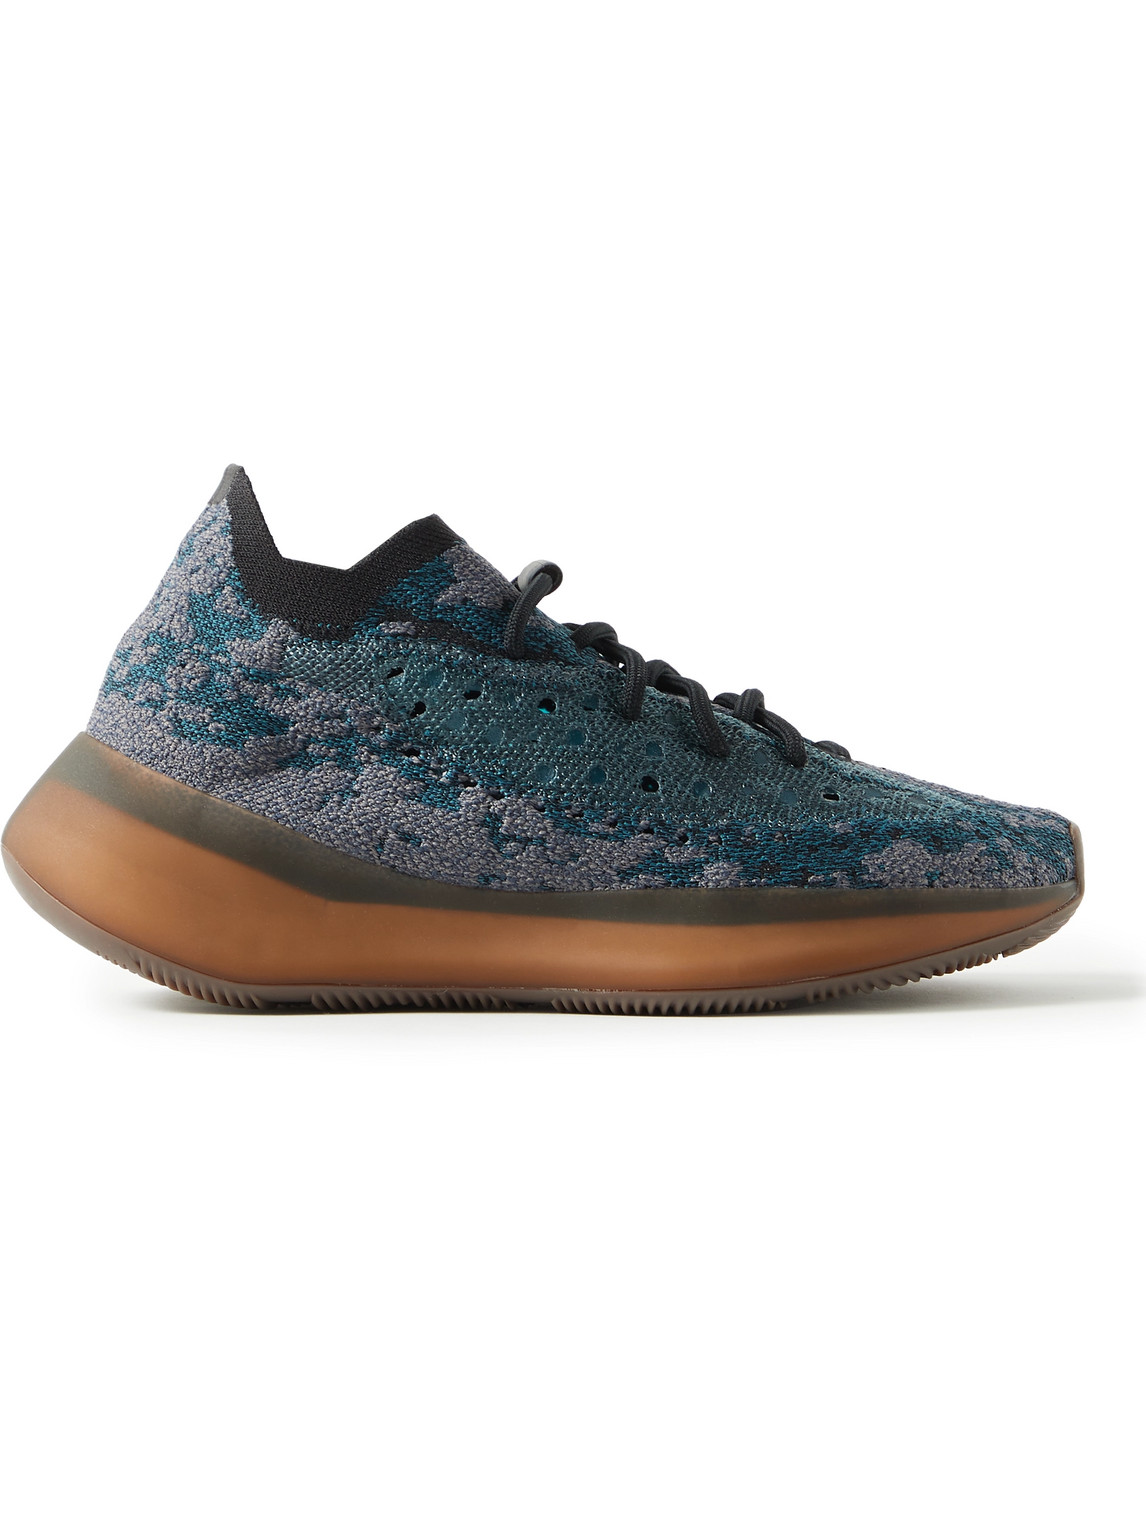 Adidas Originals Sneakers YEEZY BOOST 380 PRIMEKNIT SNEAKERS